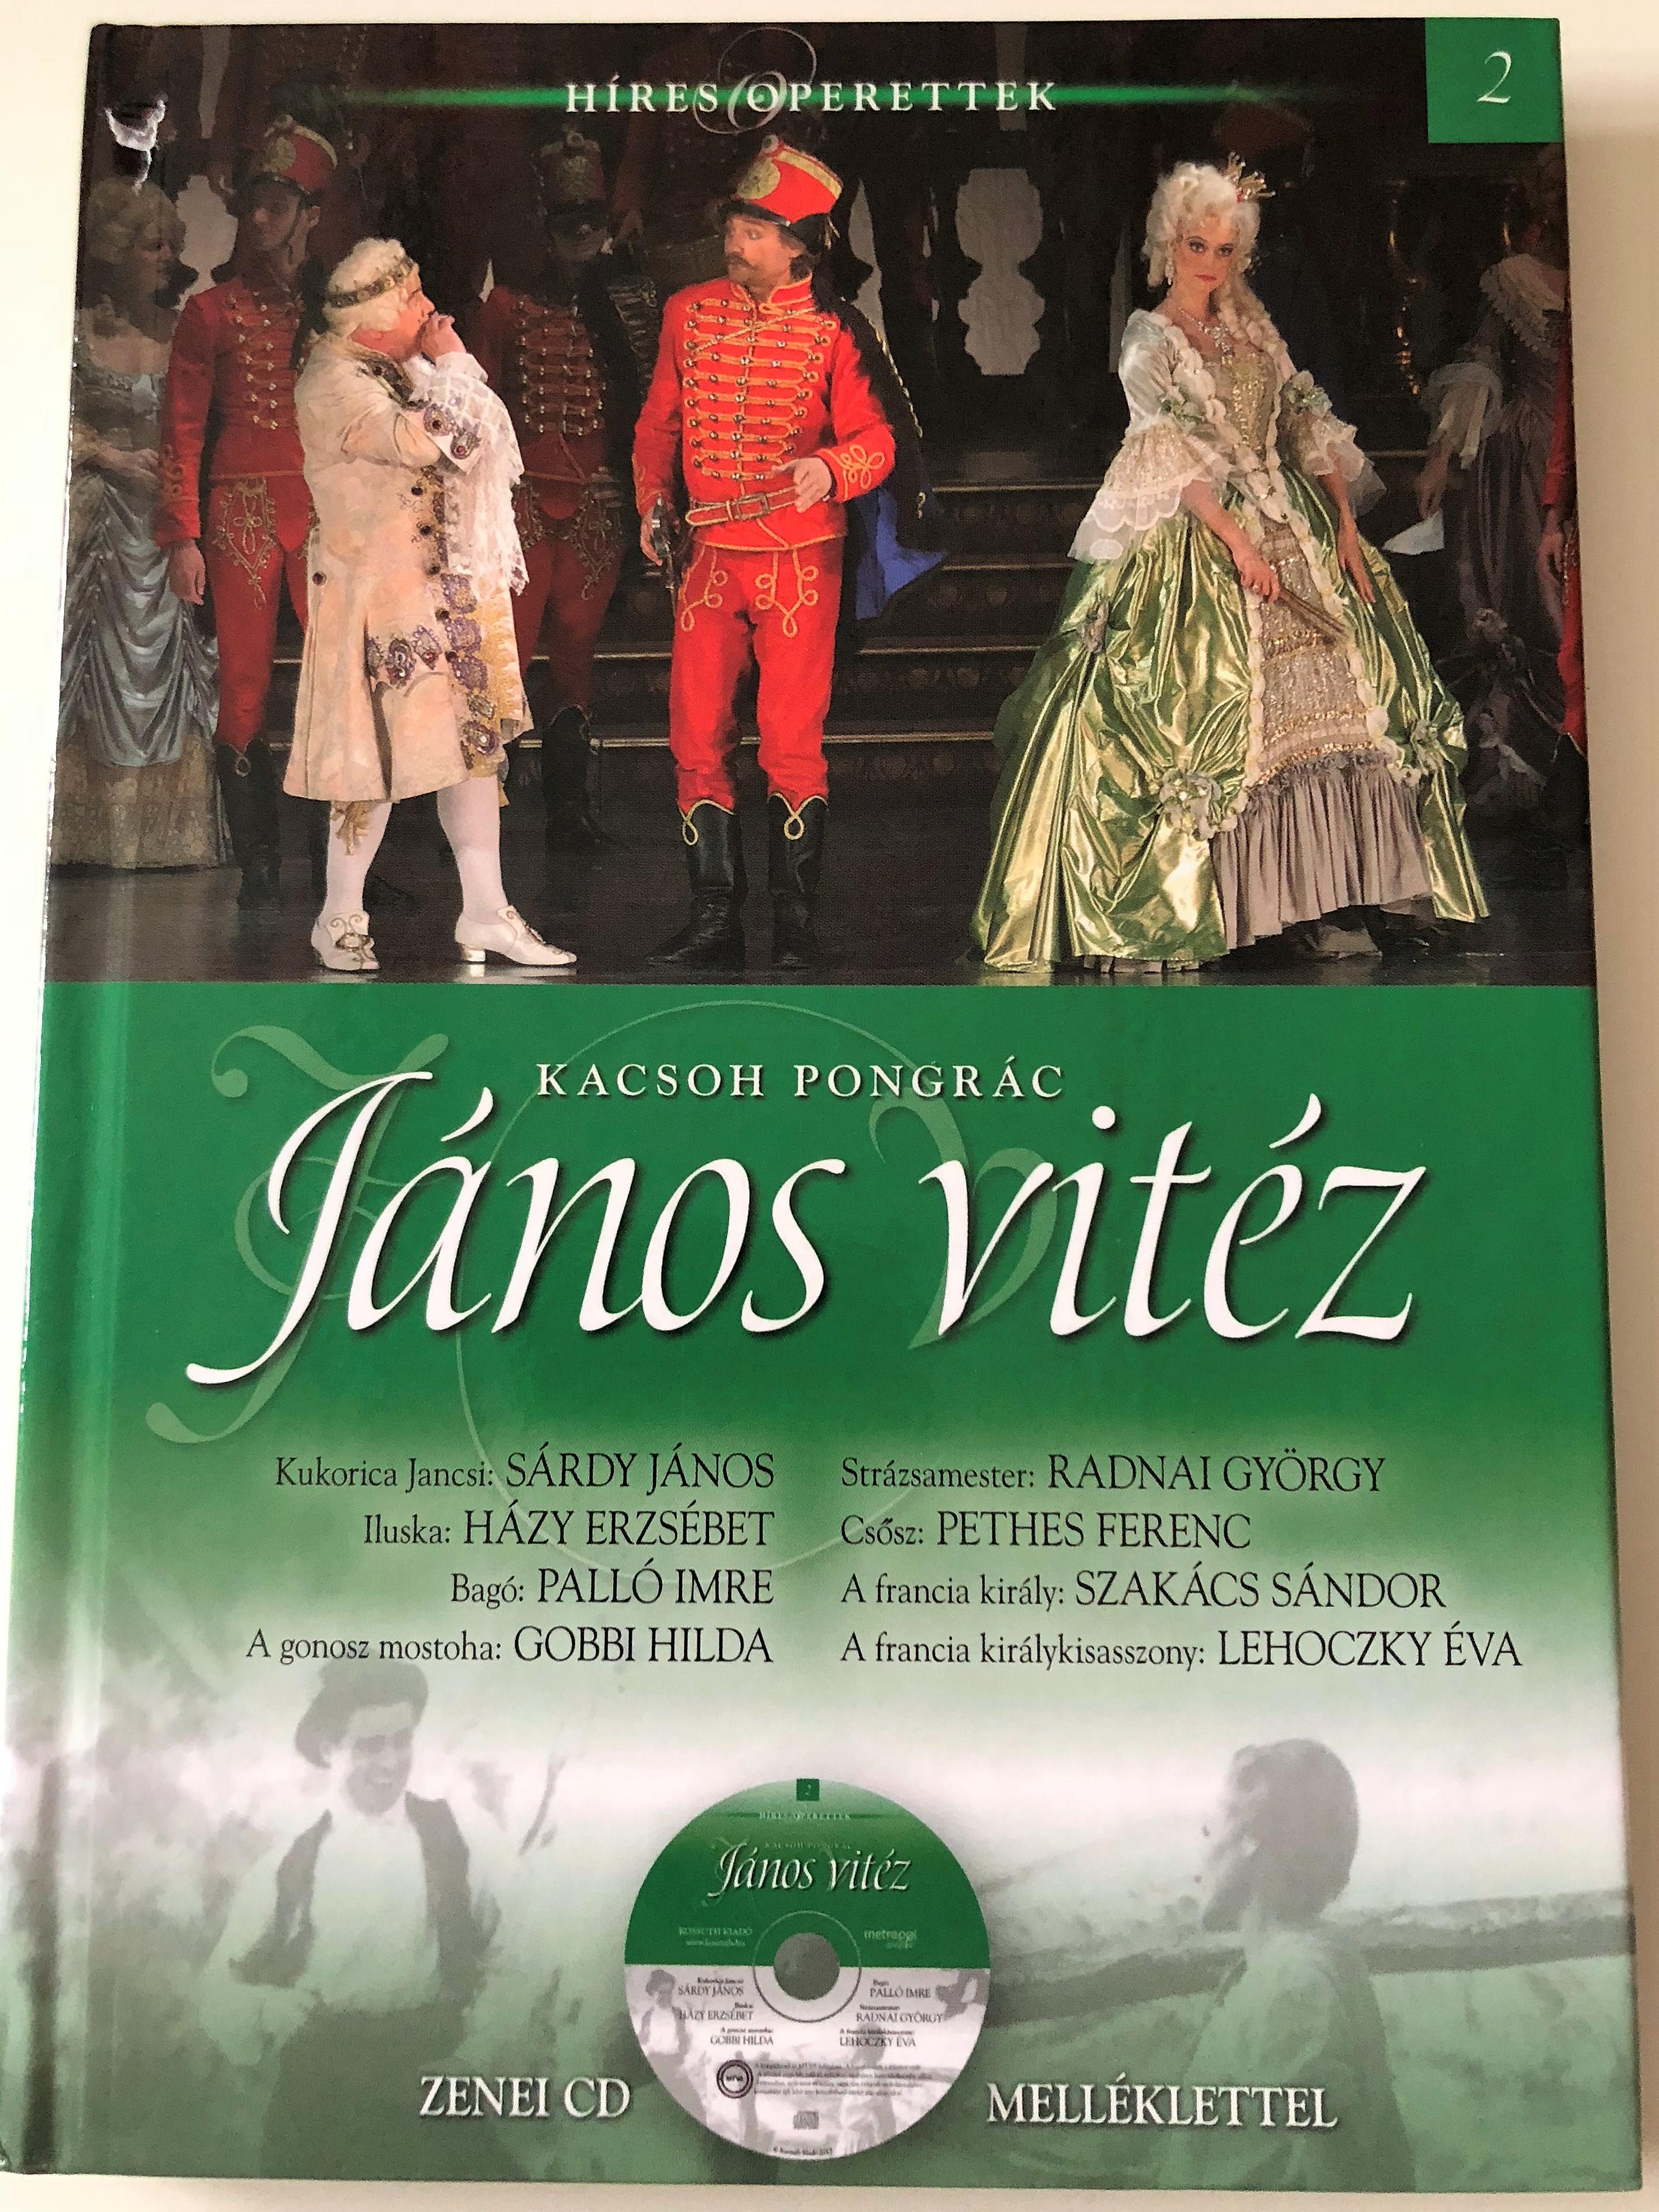 kacsoh-pongr-cz-j-nos-vit-z-hungarian-operretta-by-with-musical-cd-included-kossuth-kiad-h-res-operettek-sorozat-2.-budapesti-operettsz-nh-z-mtva-1-.jpg